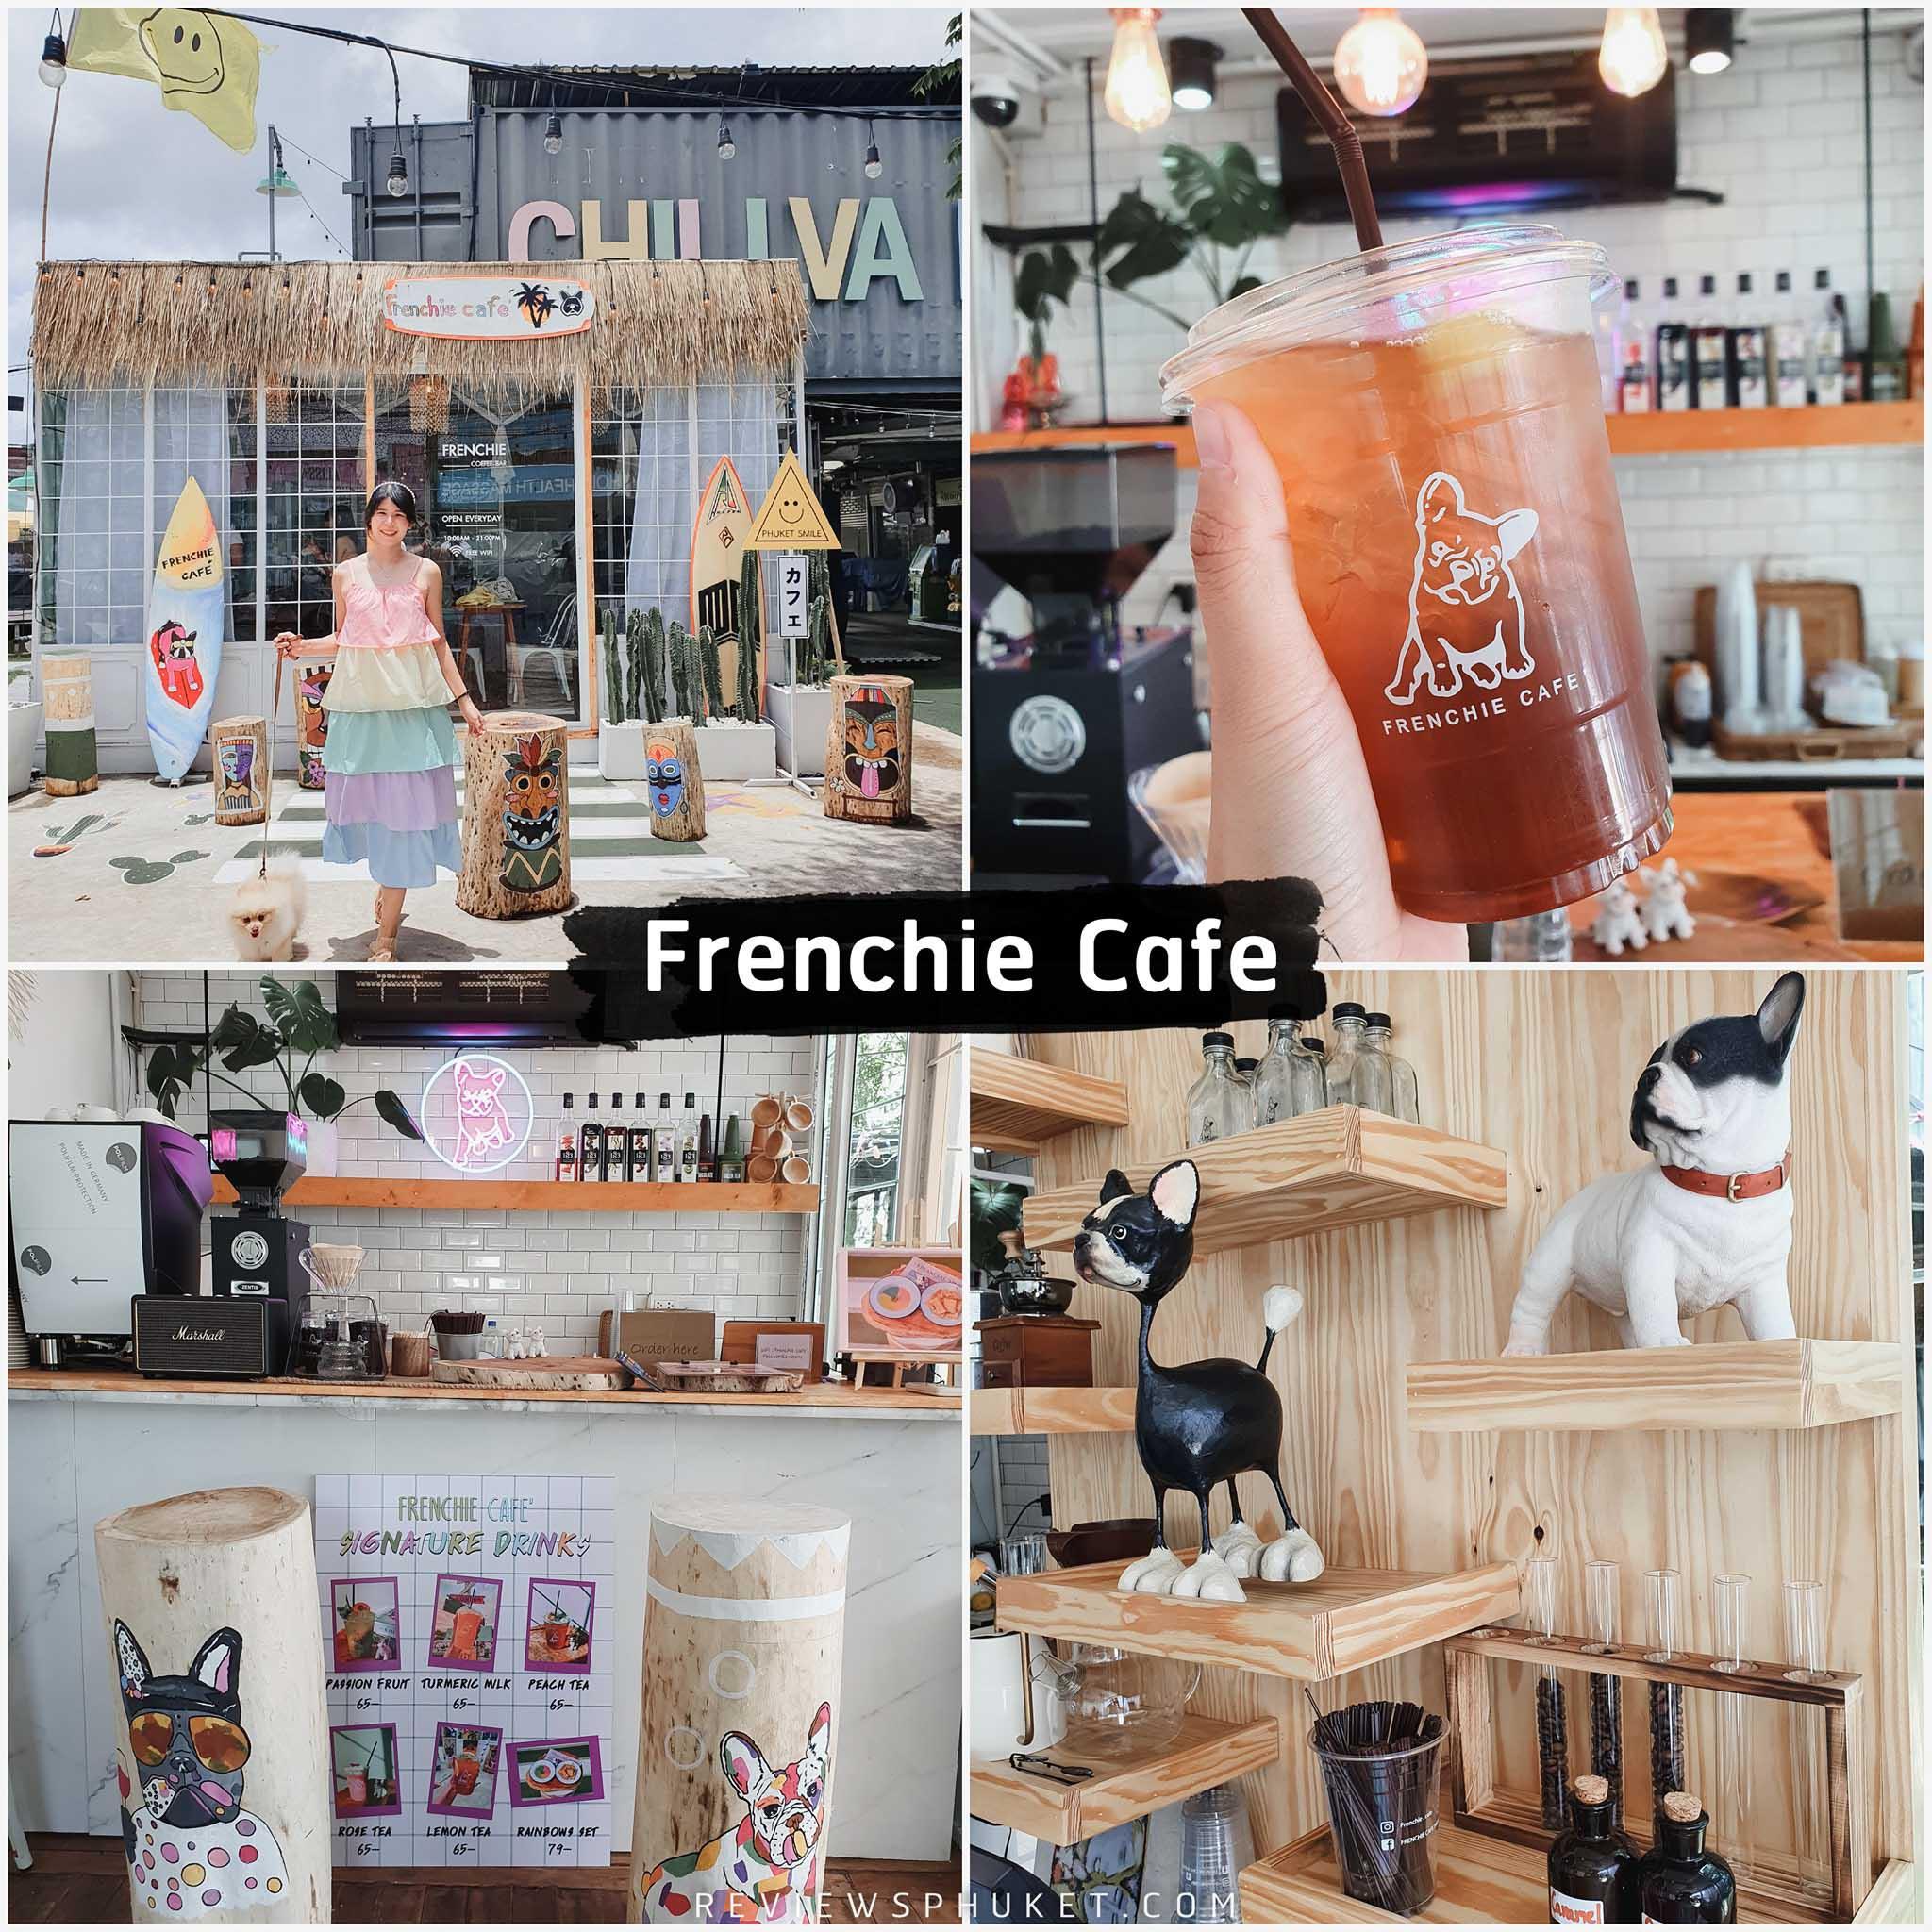 Frenchie-Cafe -ร้านน่ารักสไตล์น้องหมาา ภูเก็ต,คาเฟ่,ที่เที่ยว,ร้านกาแฟ,เด็ด,อร่อย,ต้องลอง